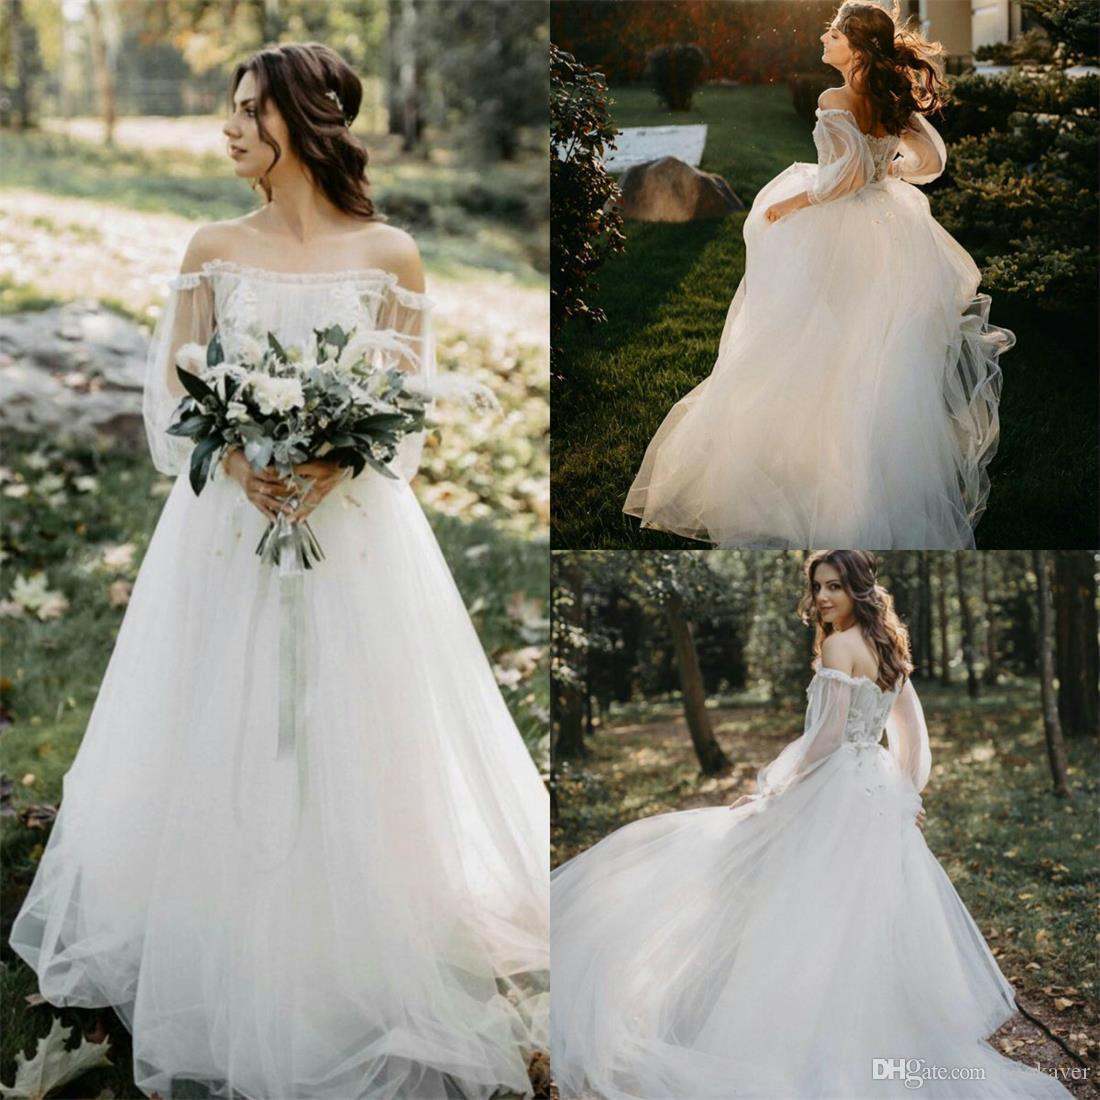 2020 Boho vestidos de novia sin tirantes de apliques de encaje de manga larga Vestidos de novia Una línea por encargo vestido barato de la boda de playa